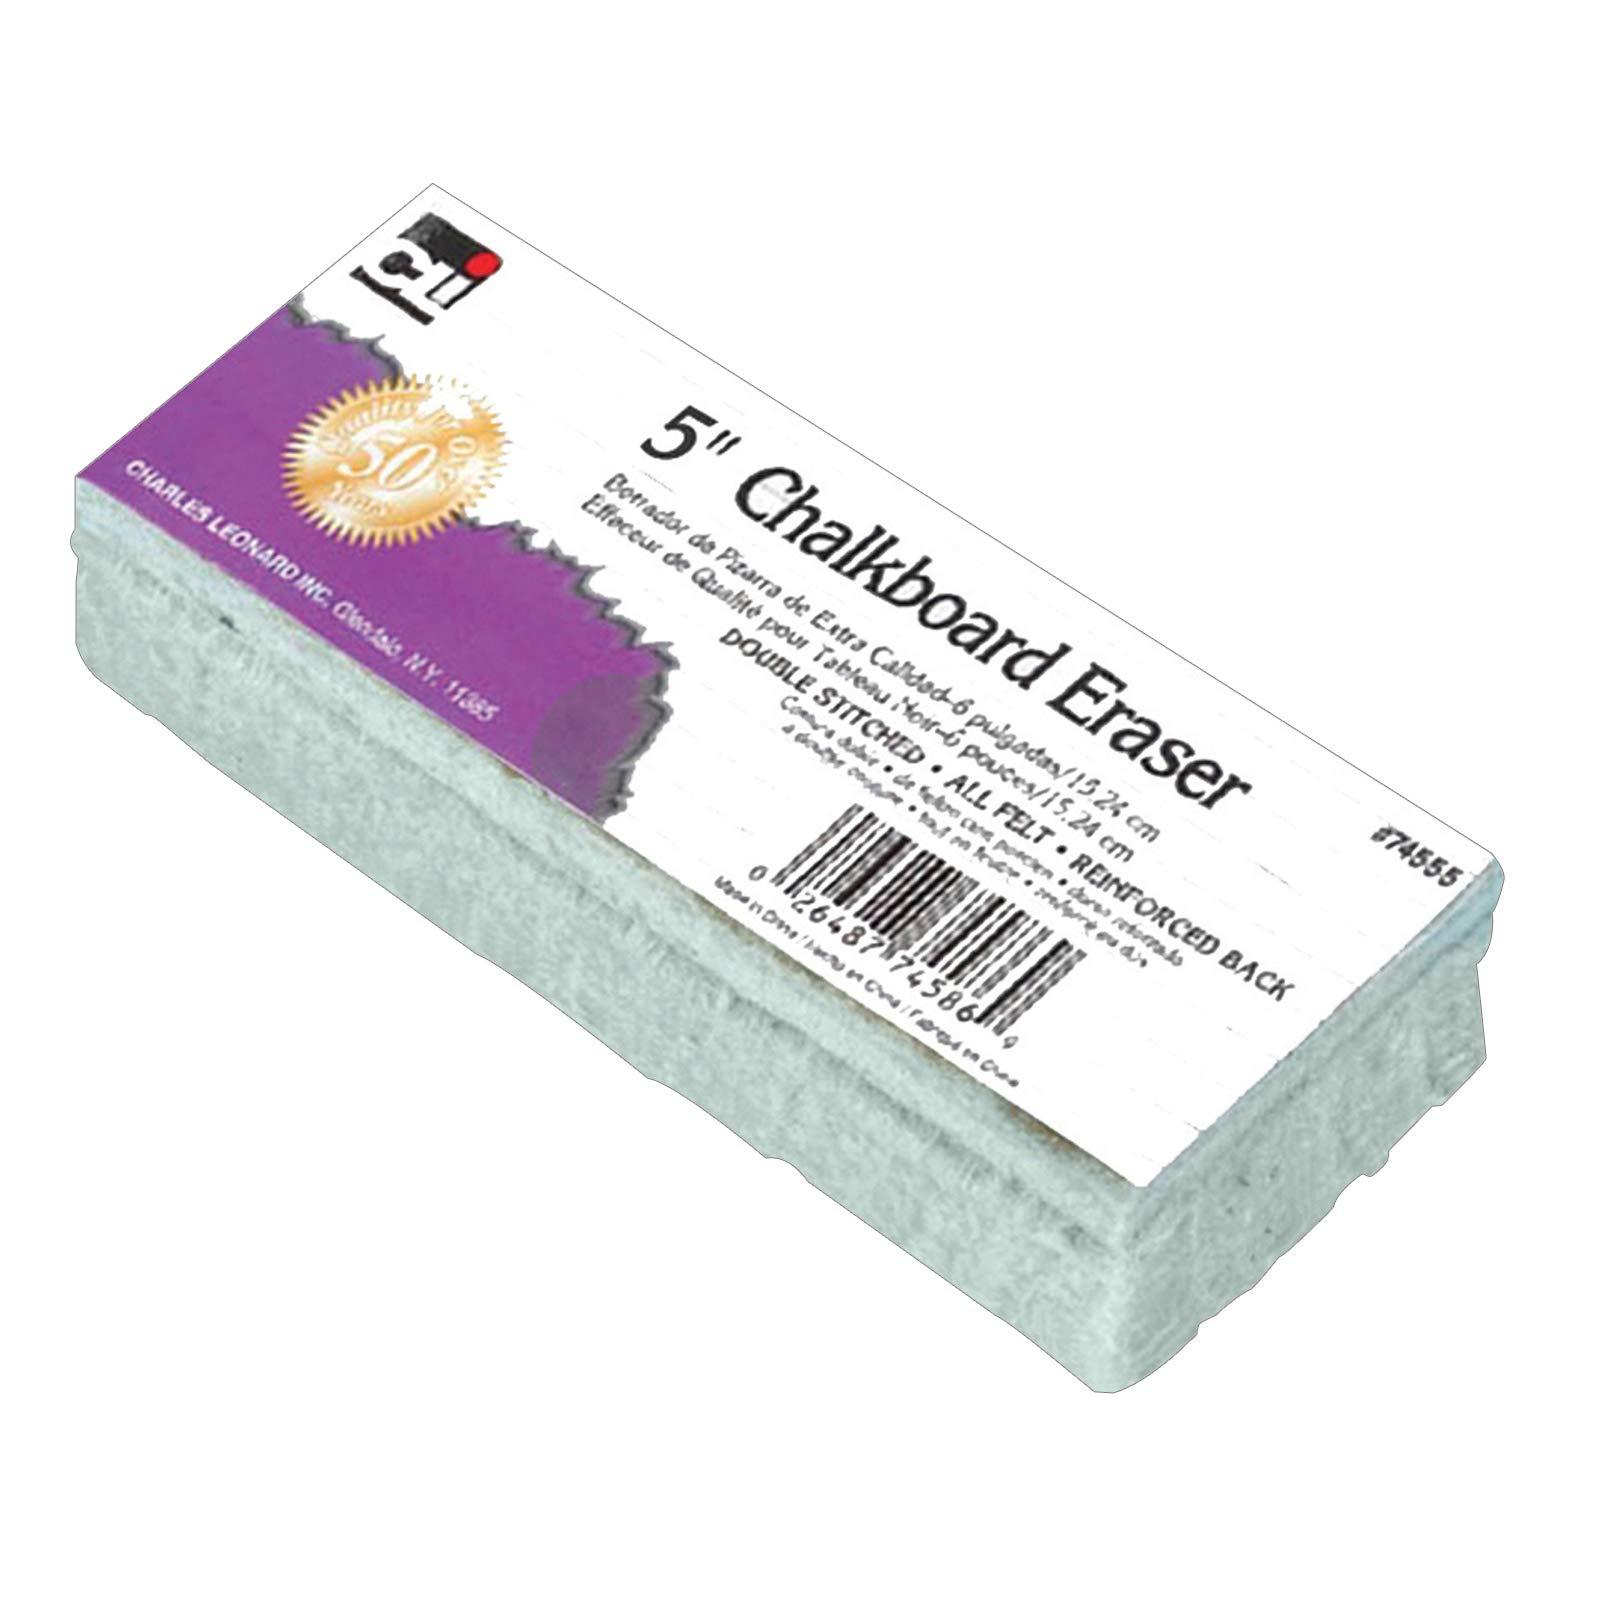 Charles Leonard CHL74555BN Standard Chalkboard Eraser, Pack of 12